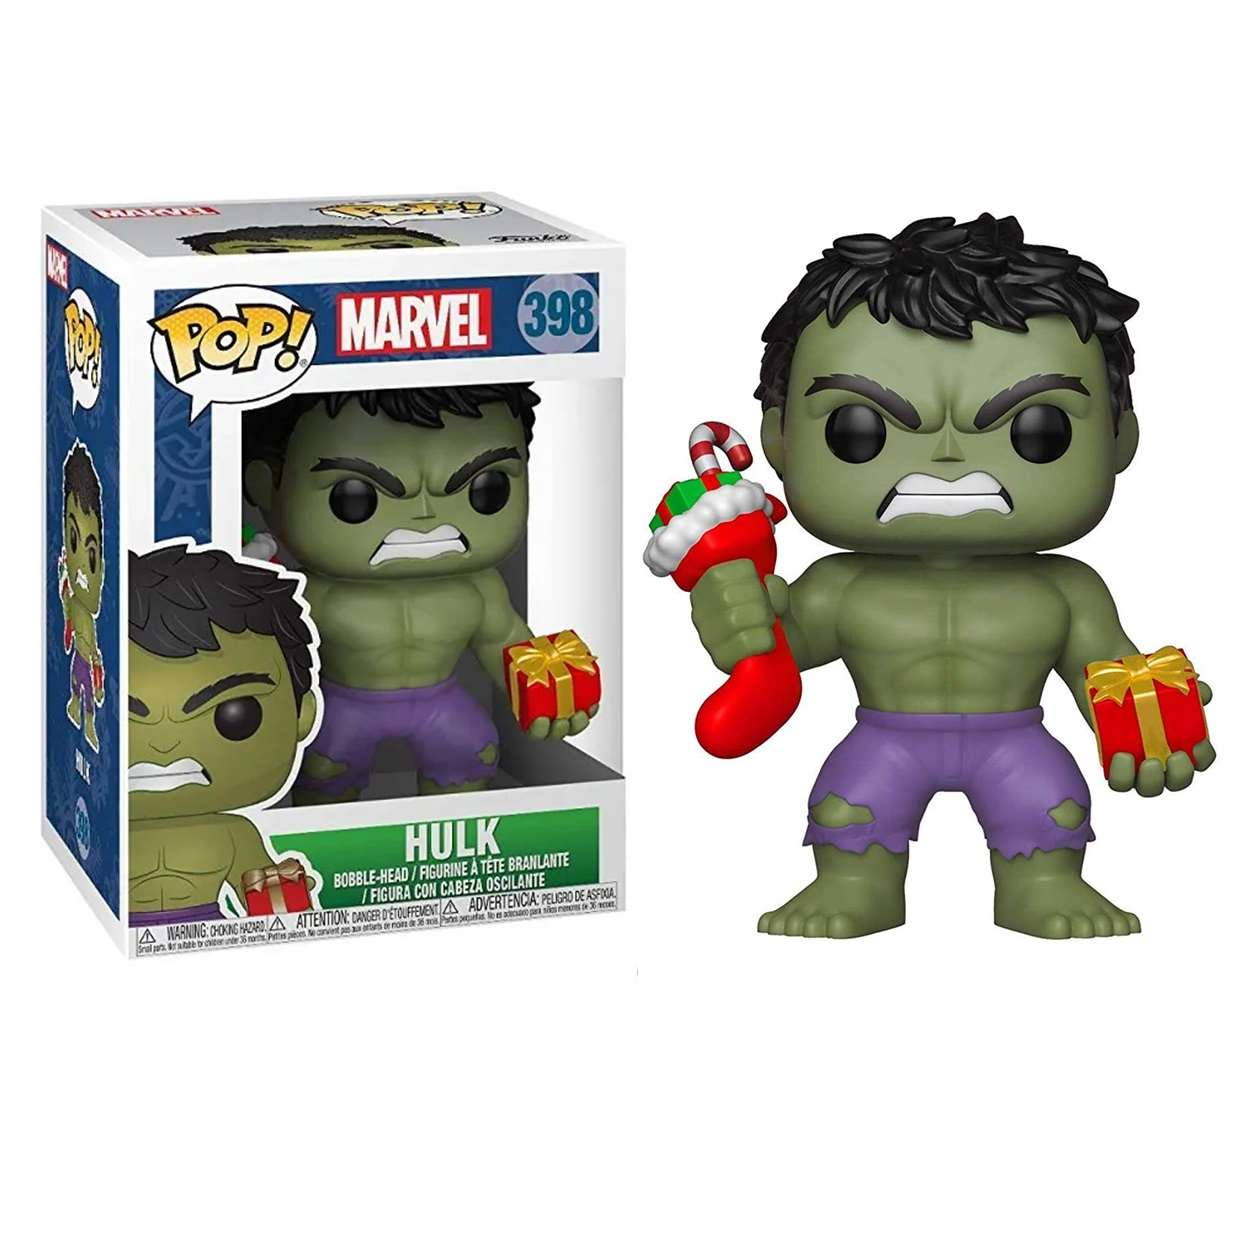 Hulk Navideño #398 Figura Marvel Funko Pop!